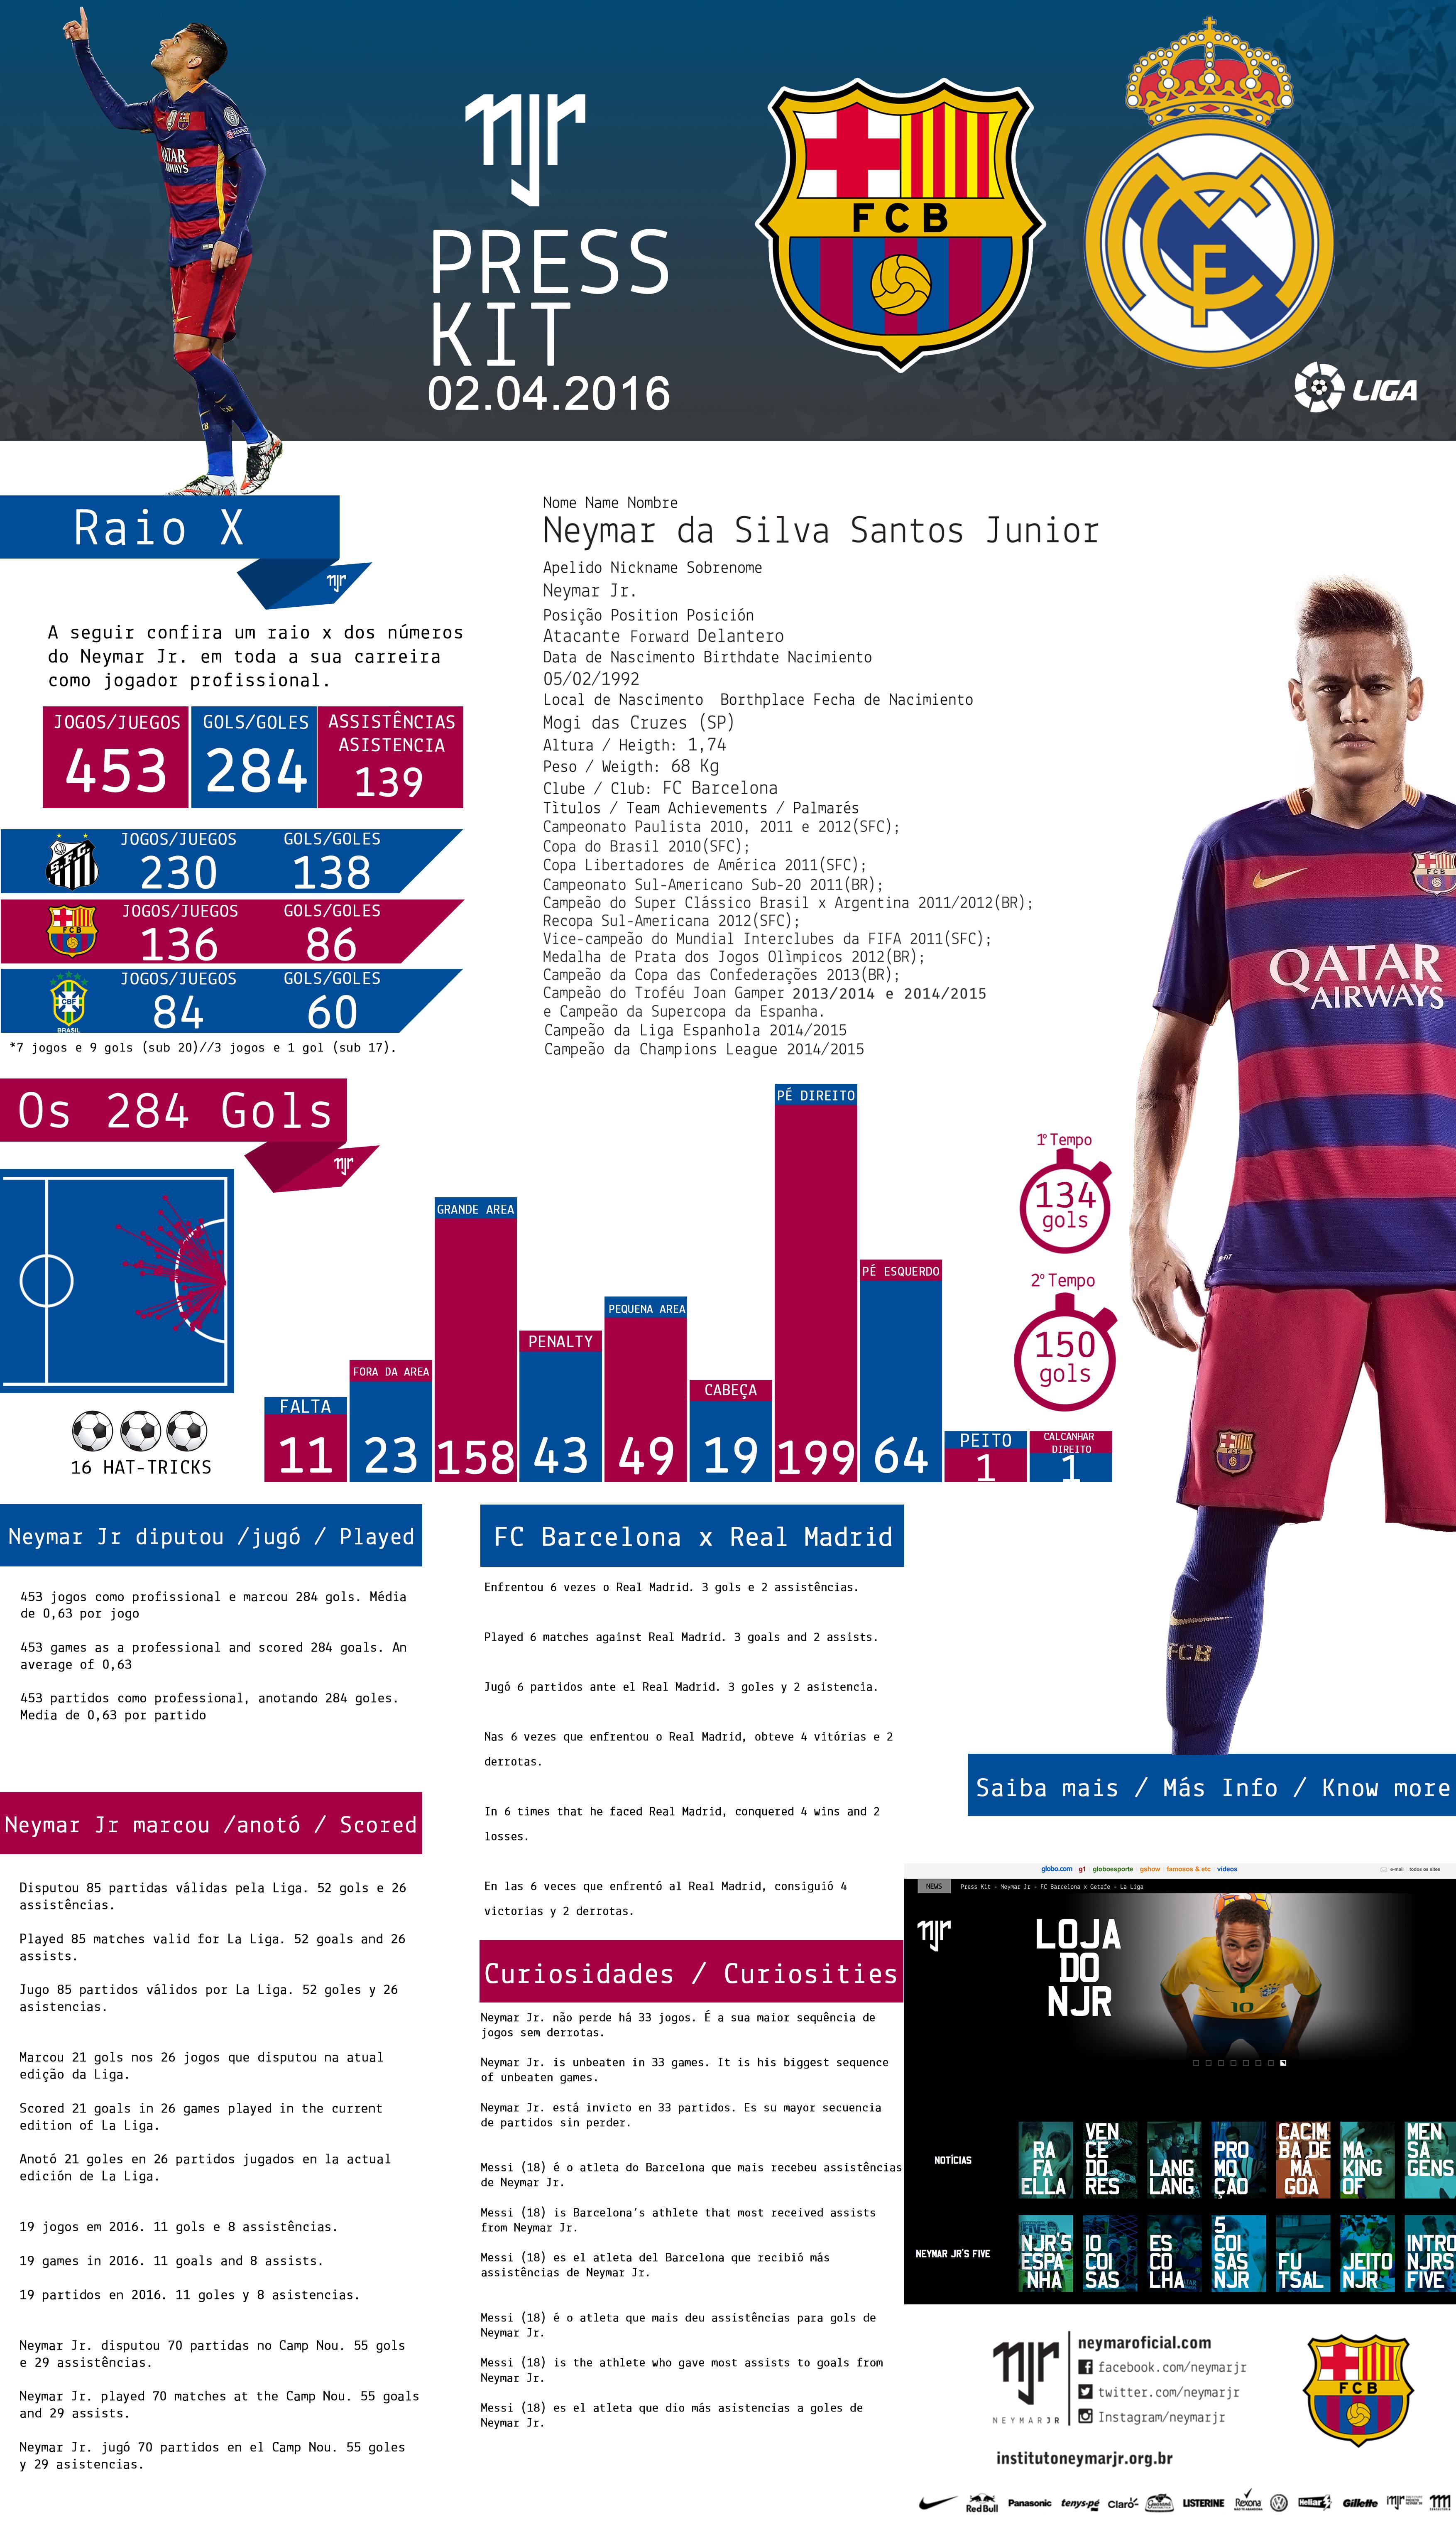 bdb4e5301d3d0 Neymar Jr.